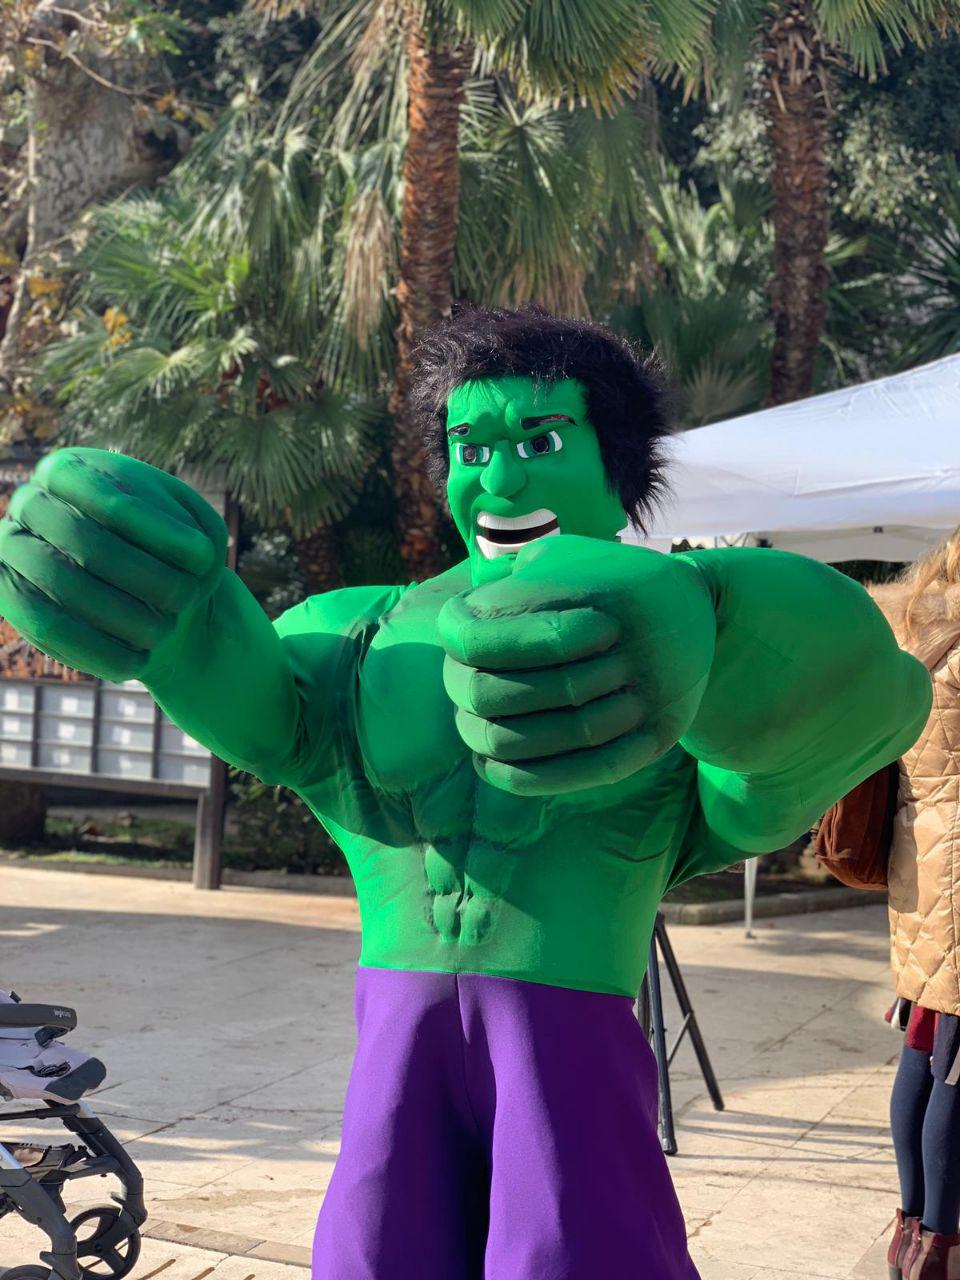 Mascotte Gigante Hulk - MonteFantasy Animation